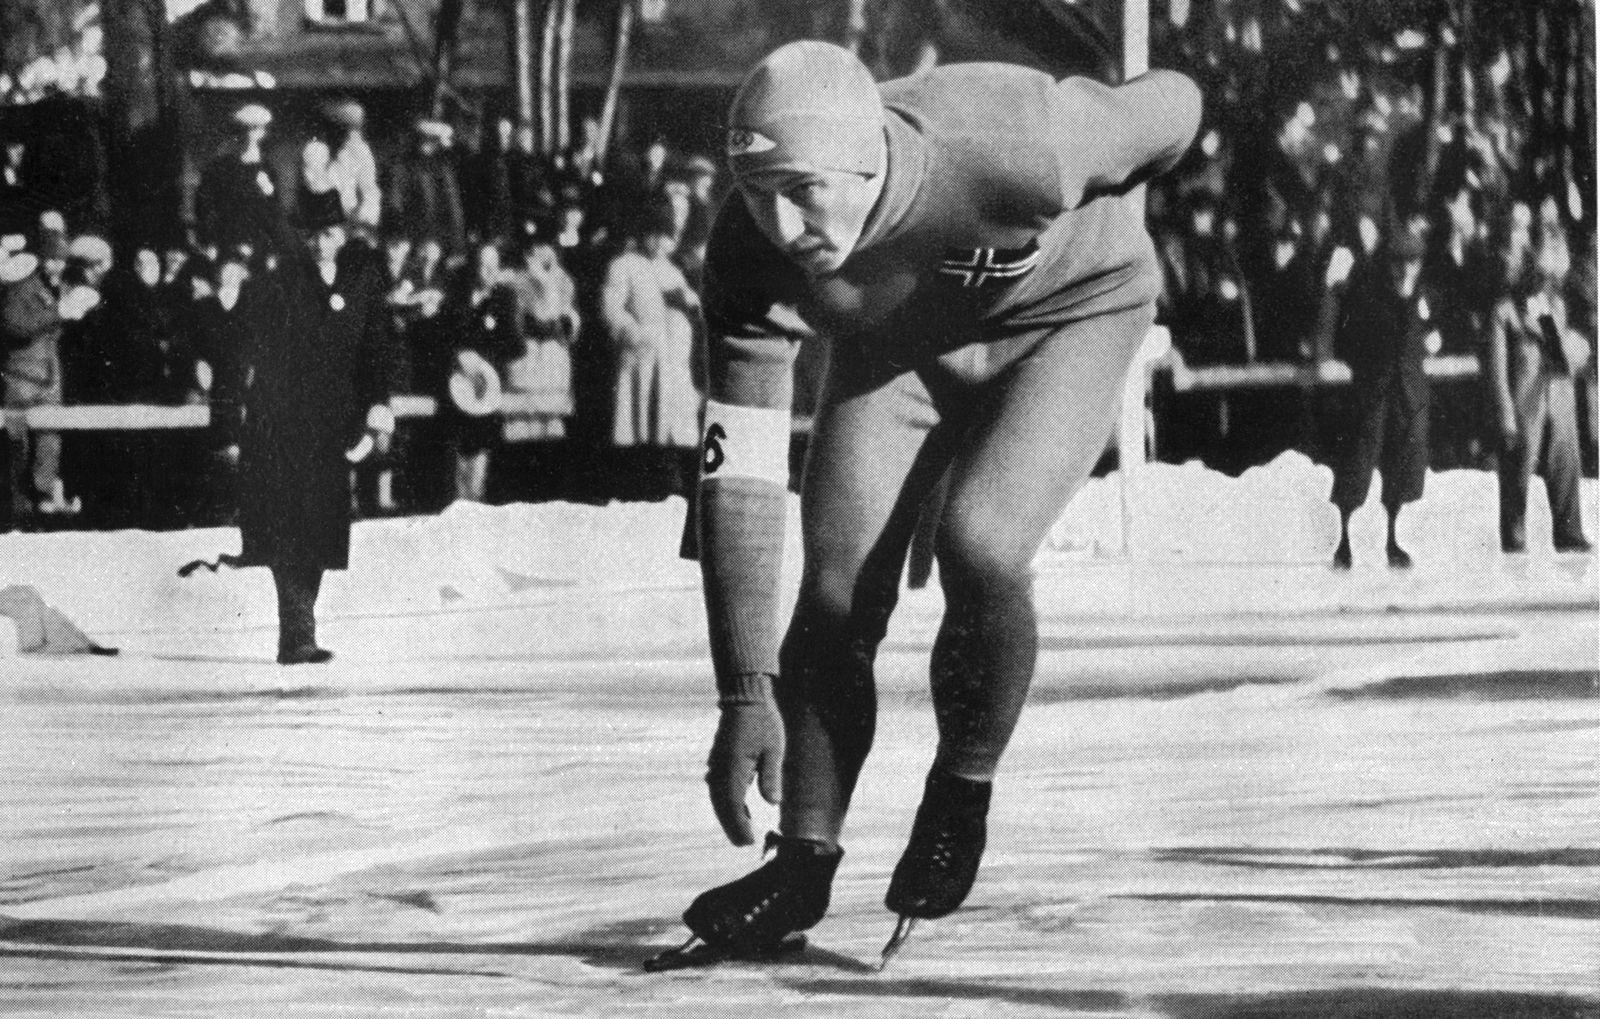 1936 Winter Olympic Games Garmisch - Partenkirchen, Germany Speed skater, Ivar Ballangrud, of Norway, won three gold me